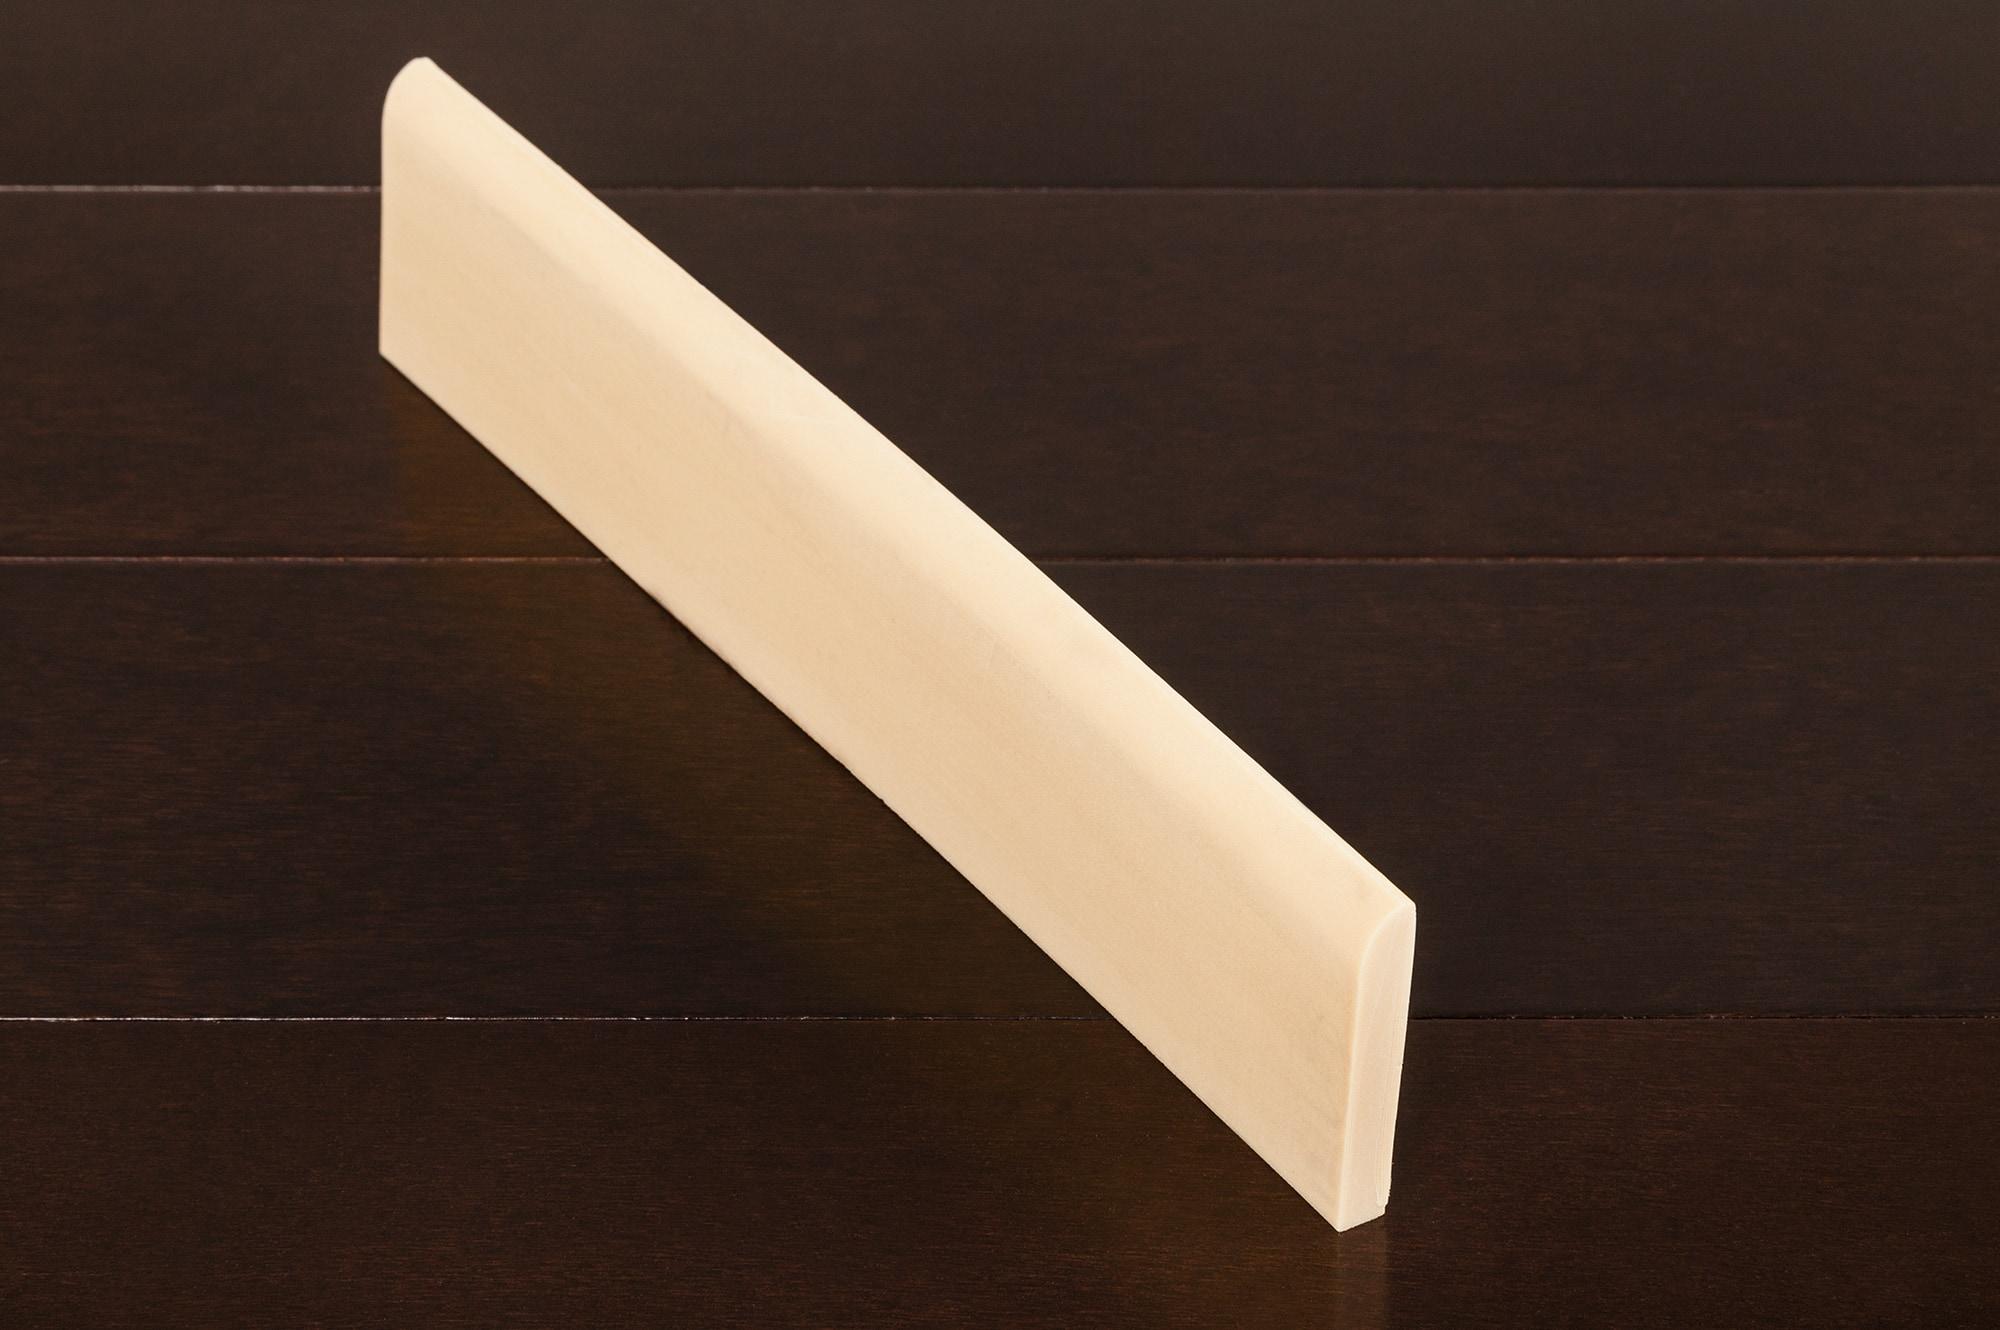 "Streamline Base - 3/8"" x 2 1/4"" x 8' / Streamline Base - 3/8"" x 2 1/4"" x 8' Moldings - Flexible Baseboards 0"